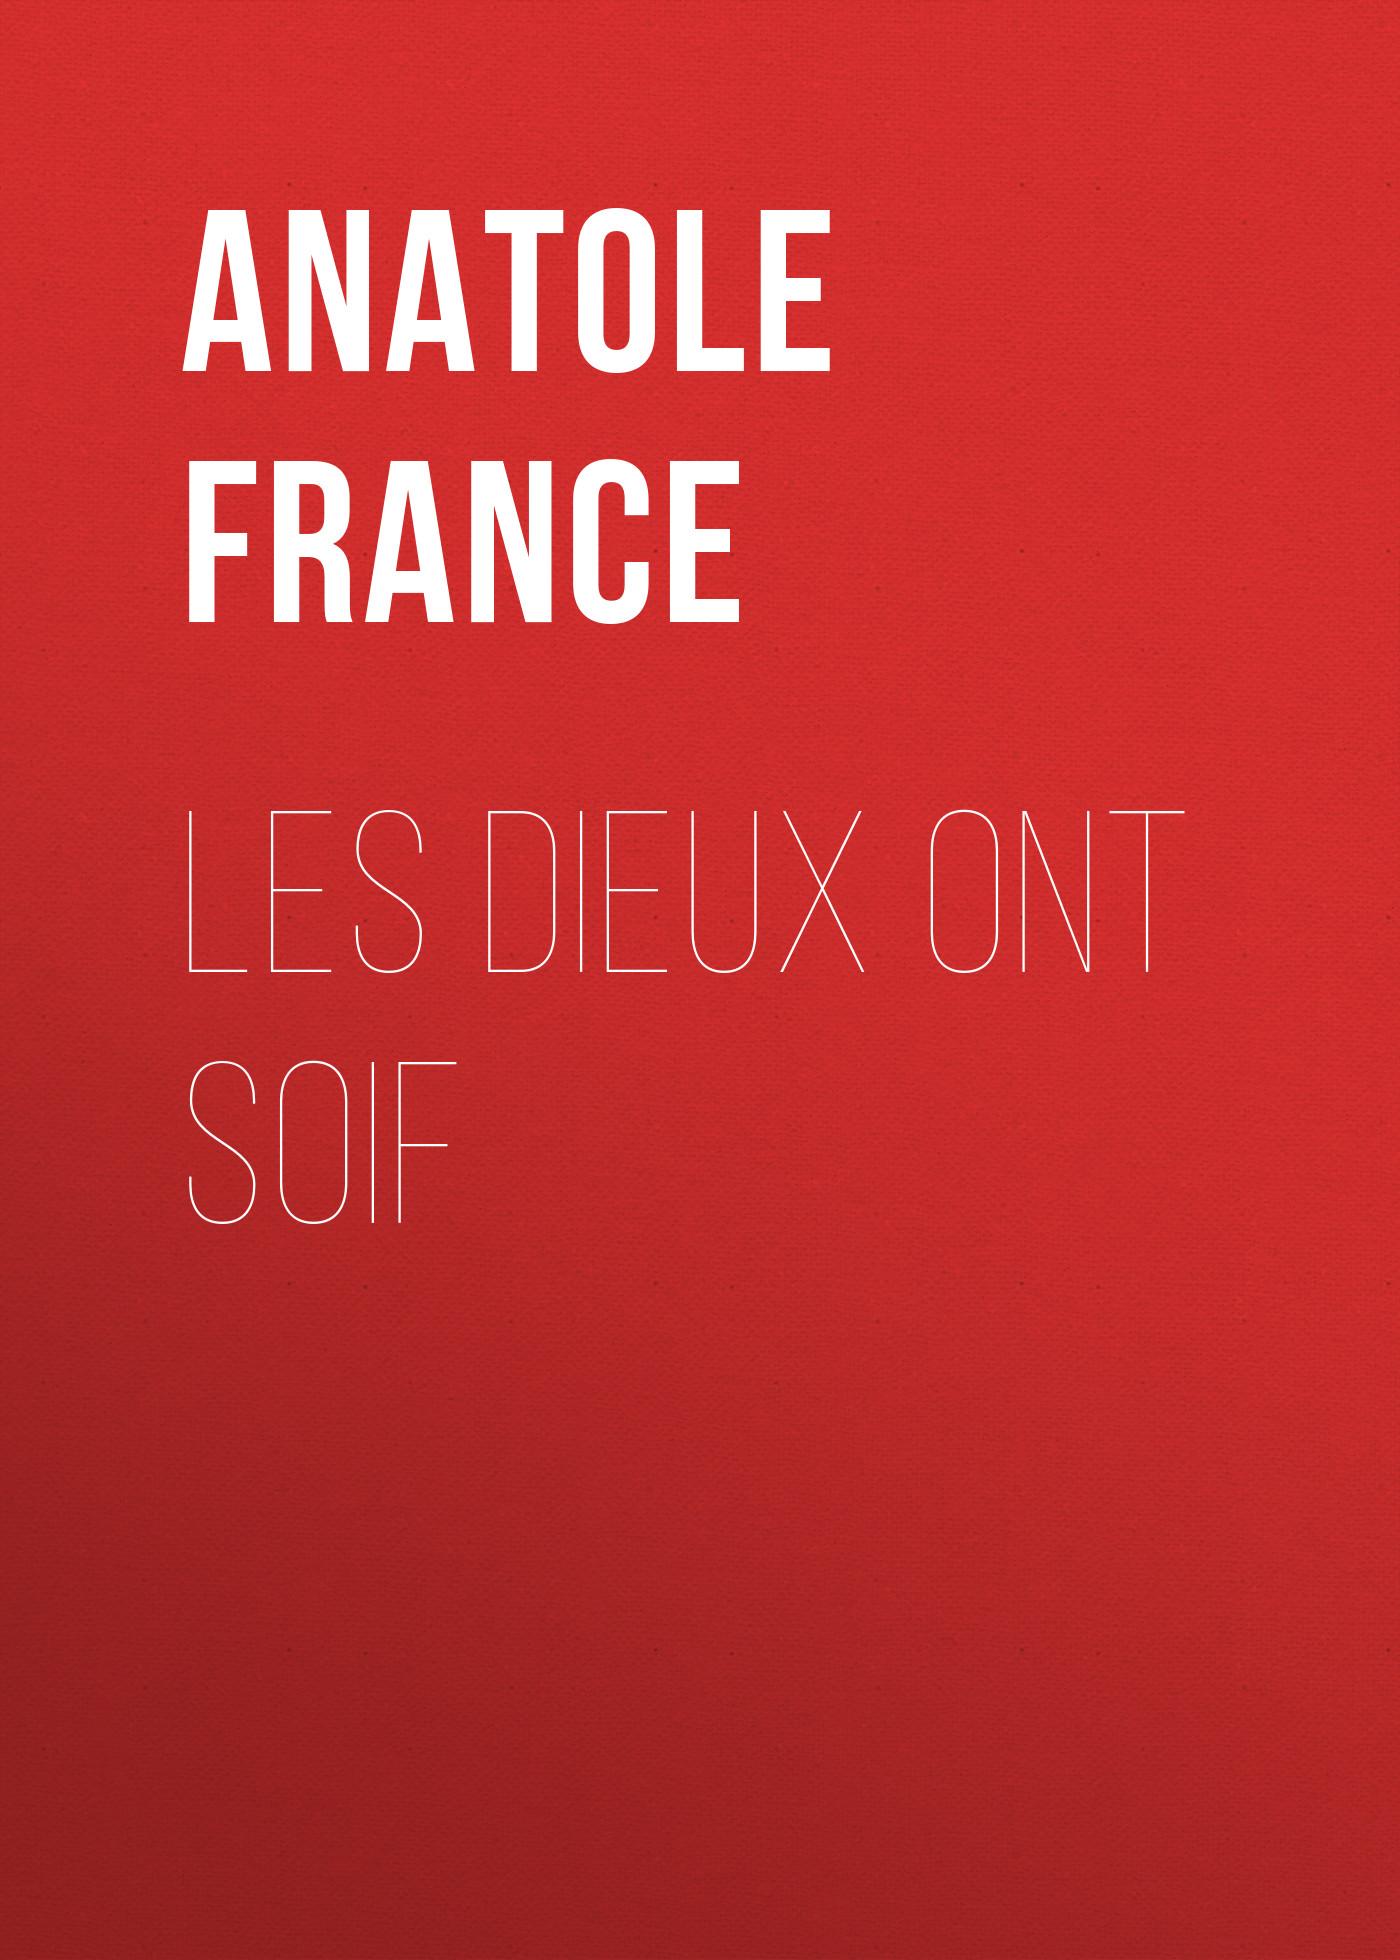 Anatole France Les Dieux ont soif anatole france the white stone